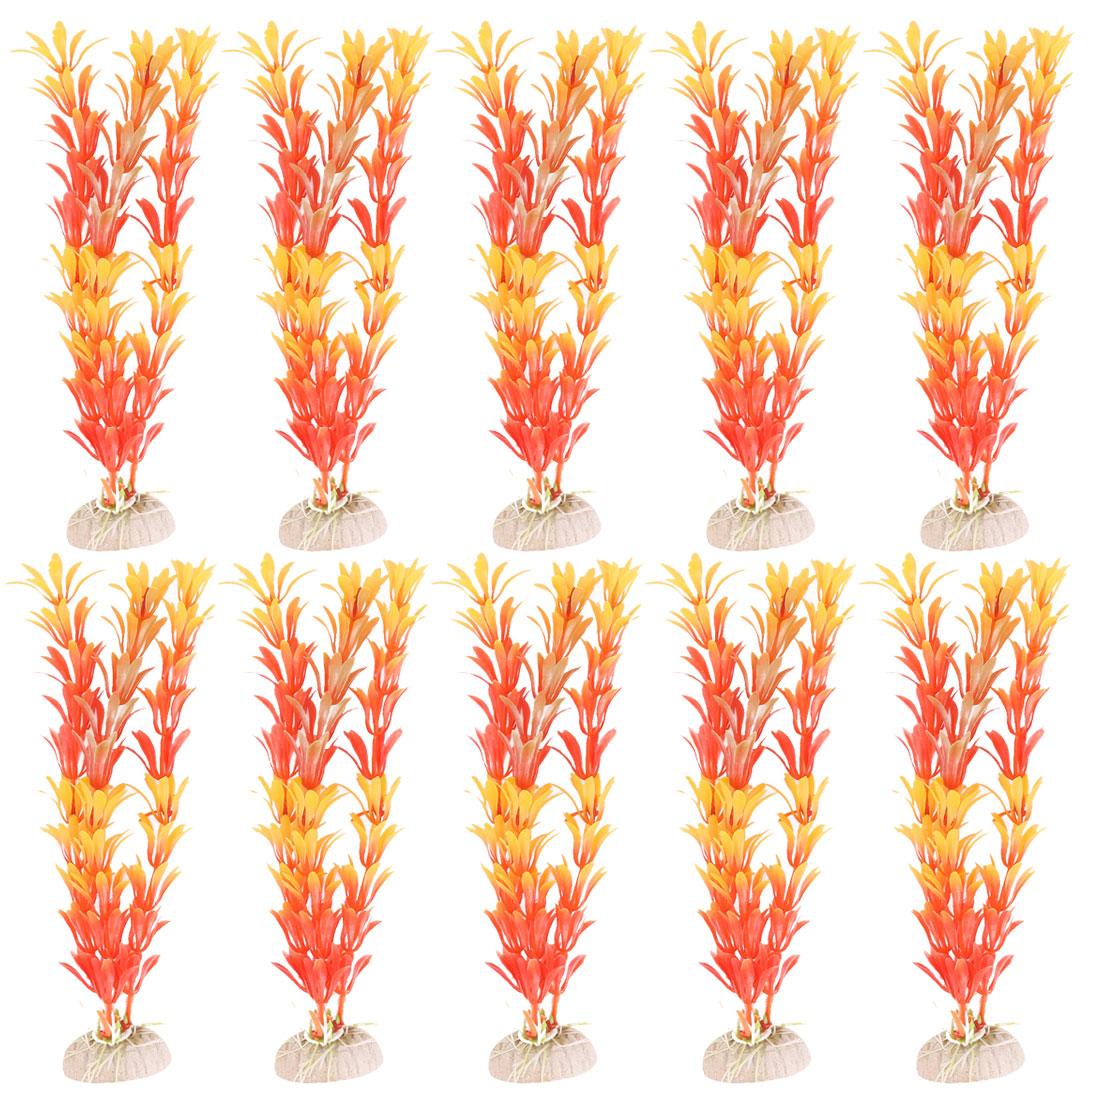 Orange Plastic Aquarium Tank Plants Decoration Grass x 10